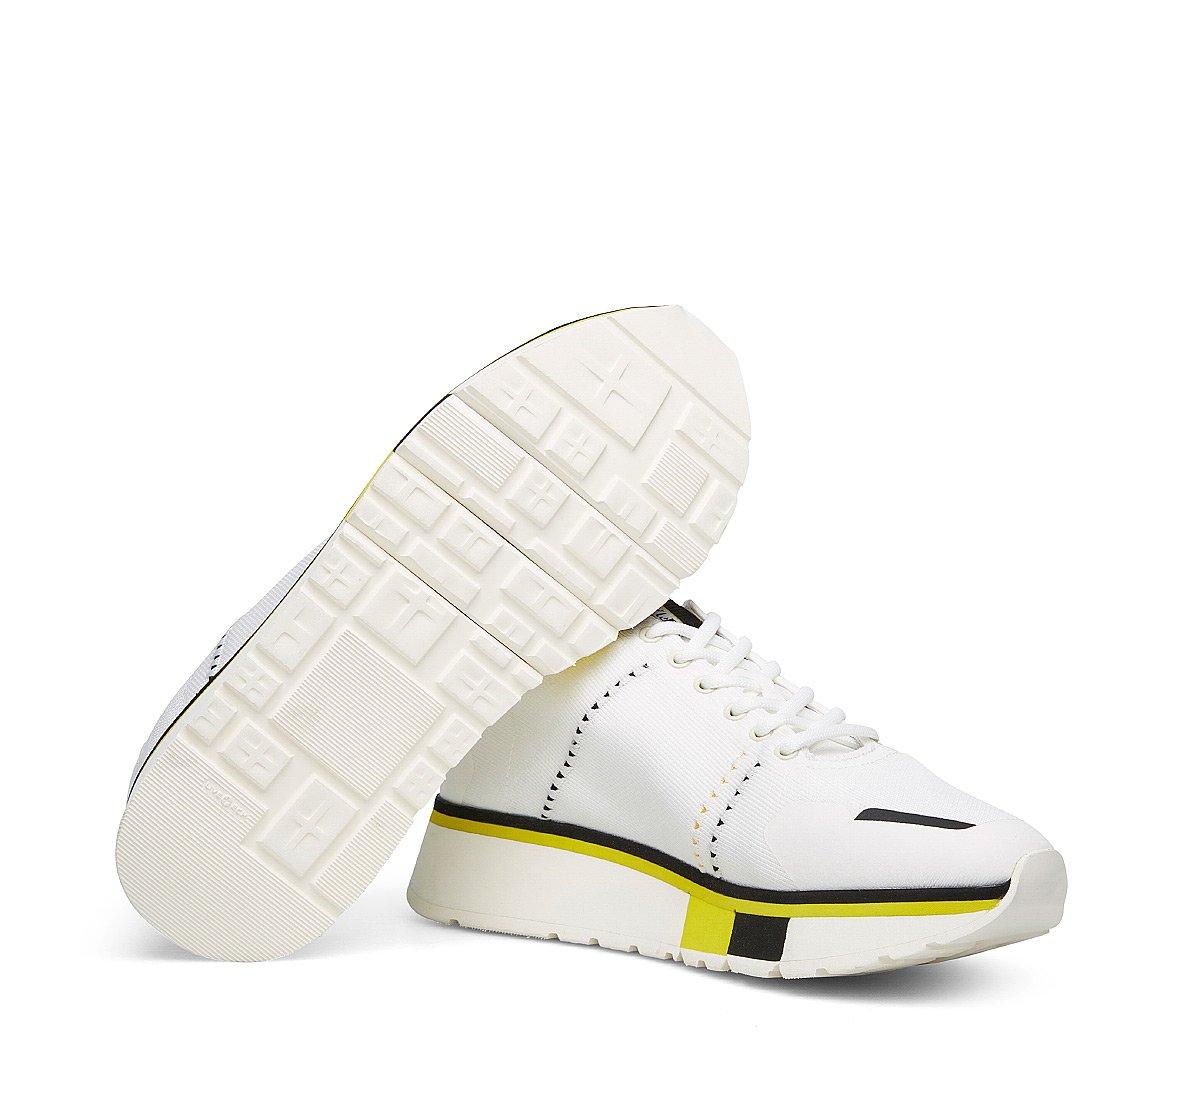 F65 sneakers